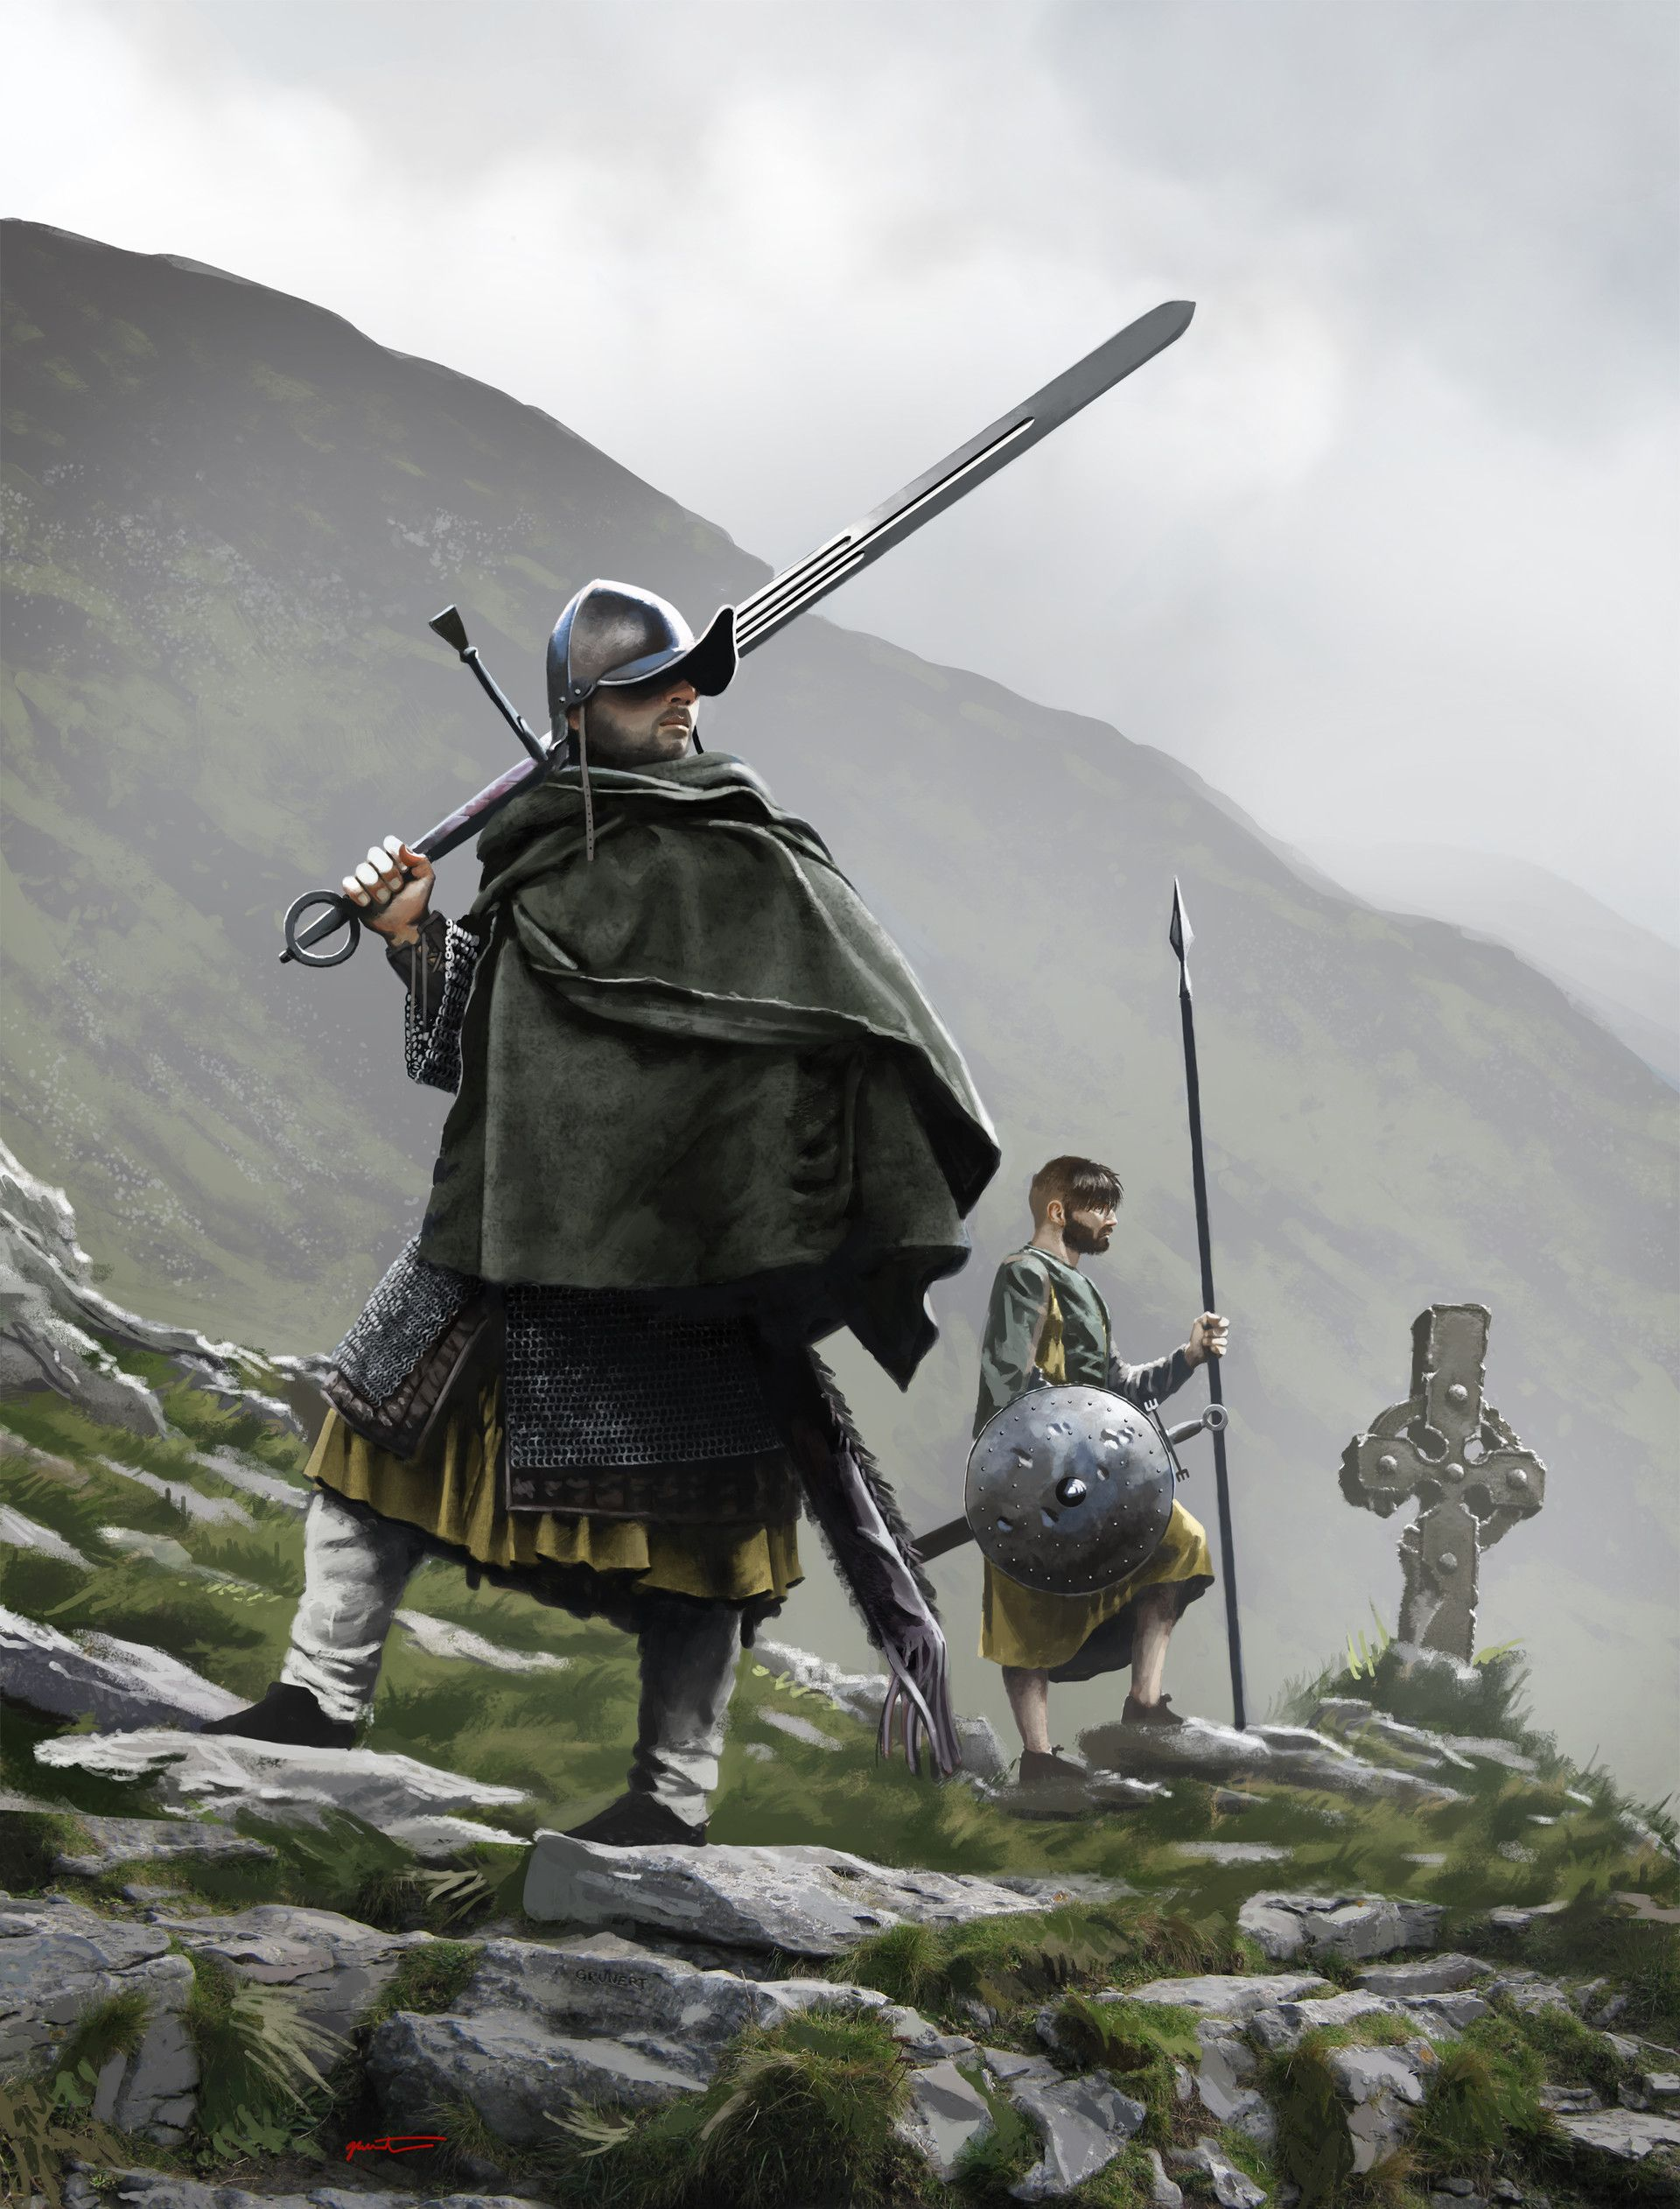 ArtStation - Irish Gallowglass warrior and Irish Kern, Marc Grunert